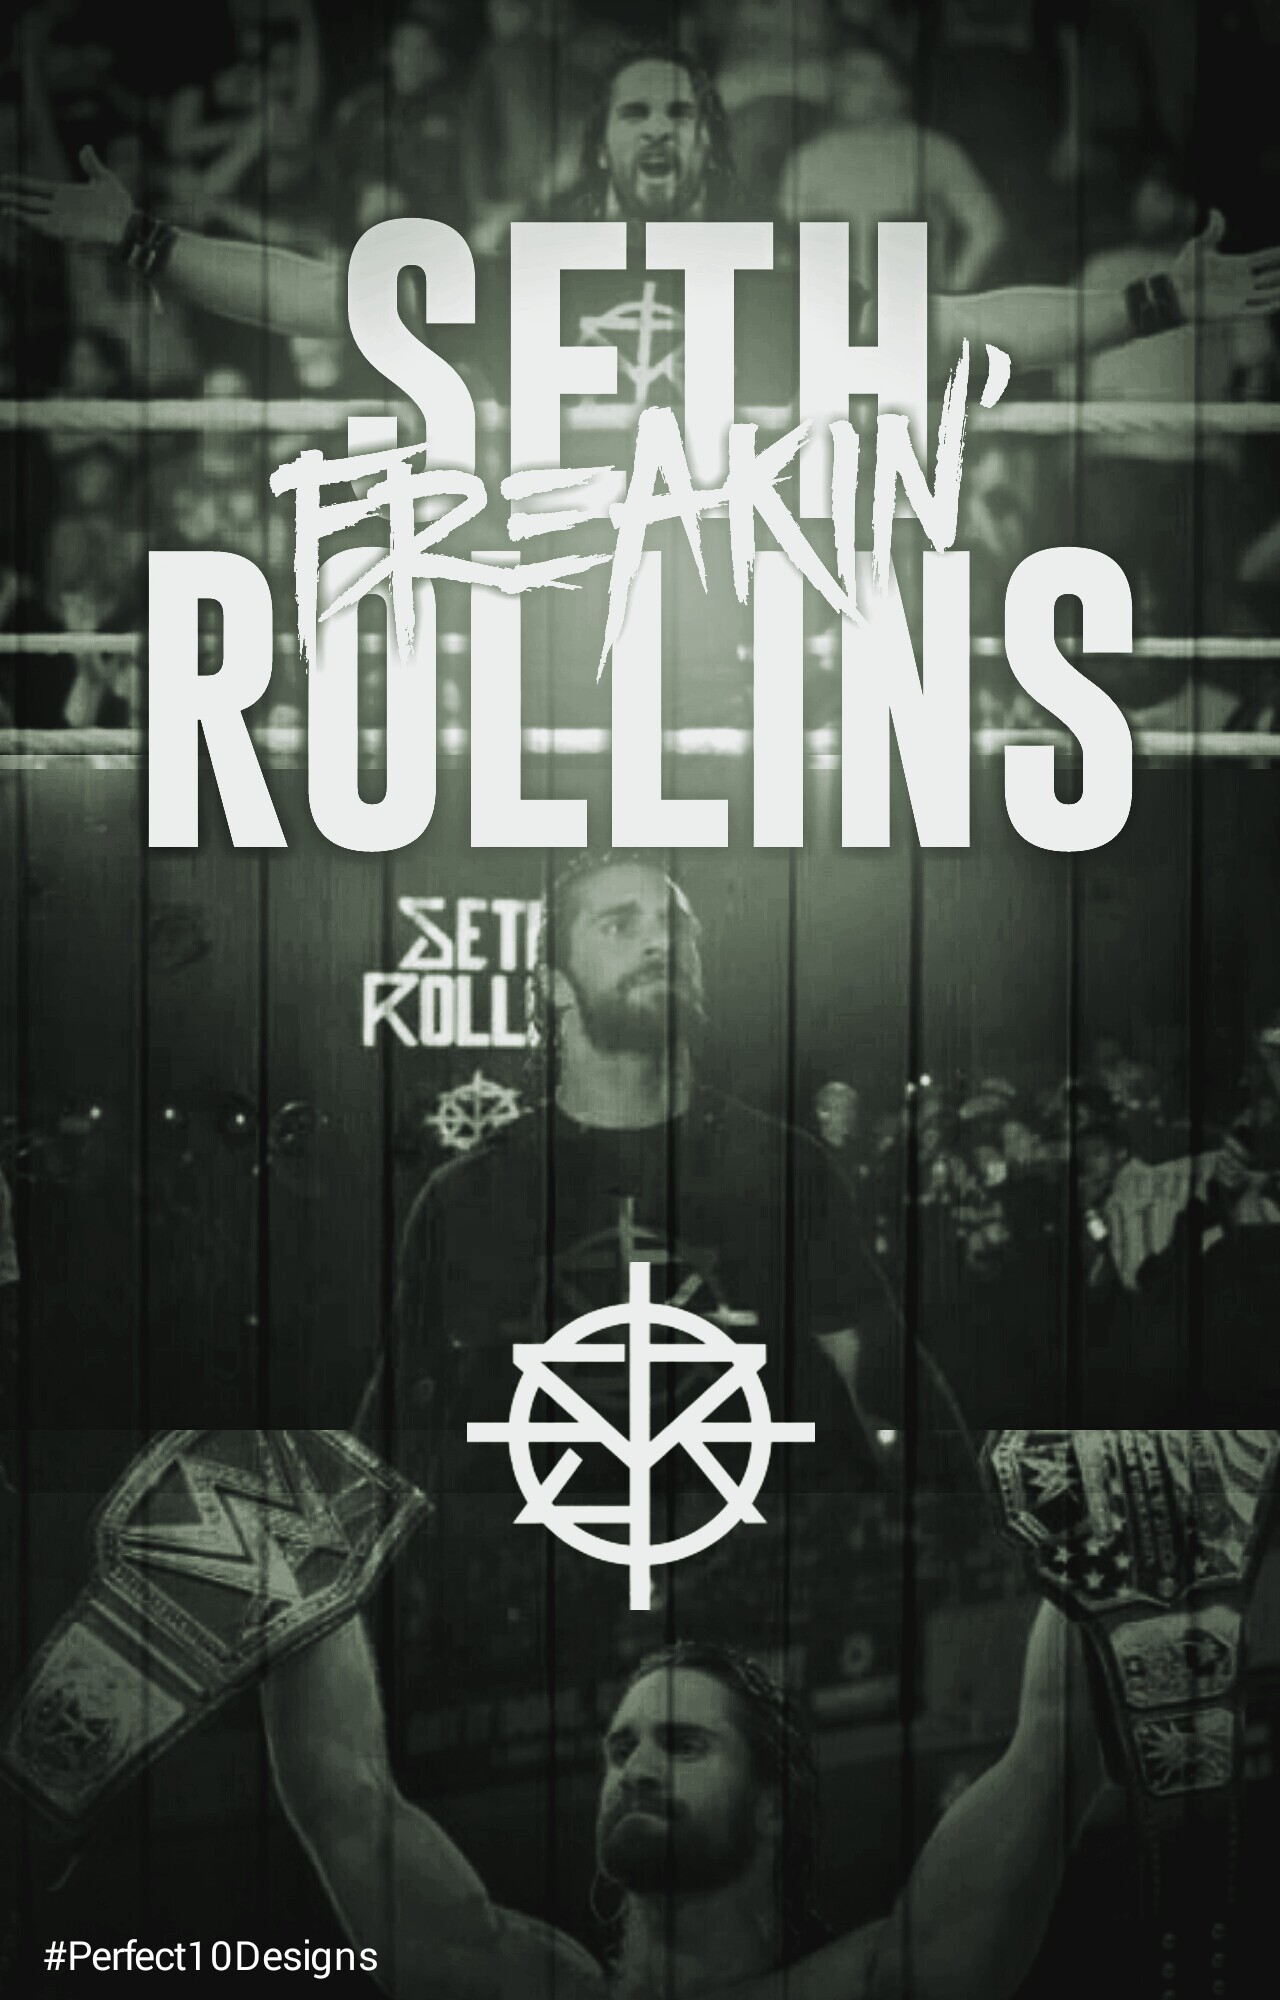 how to draw seth rollins logo